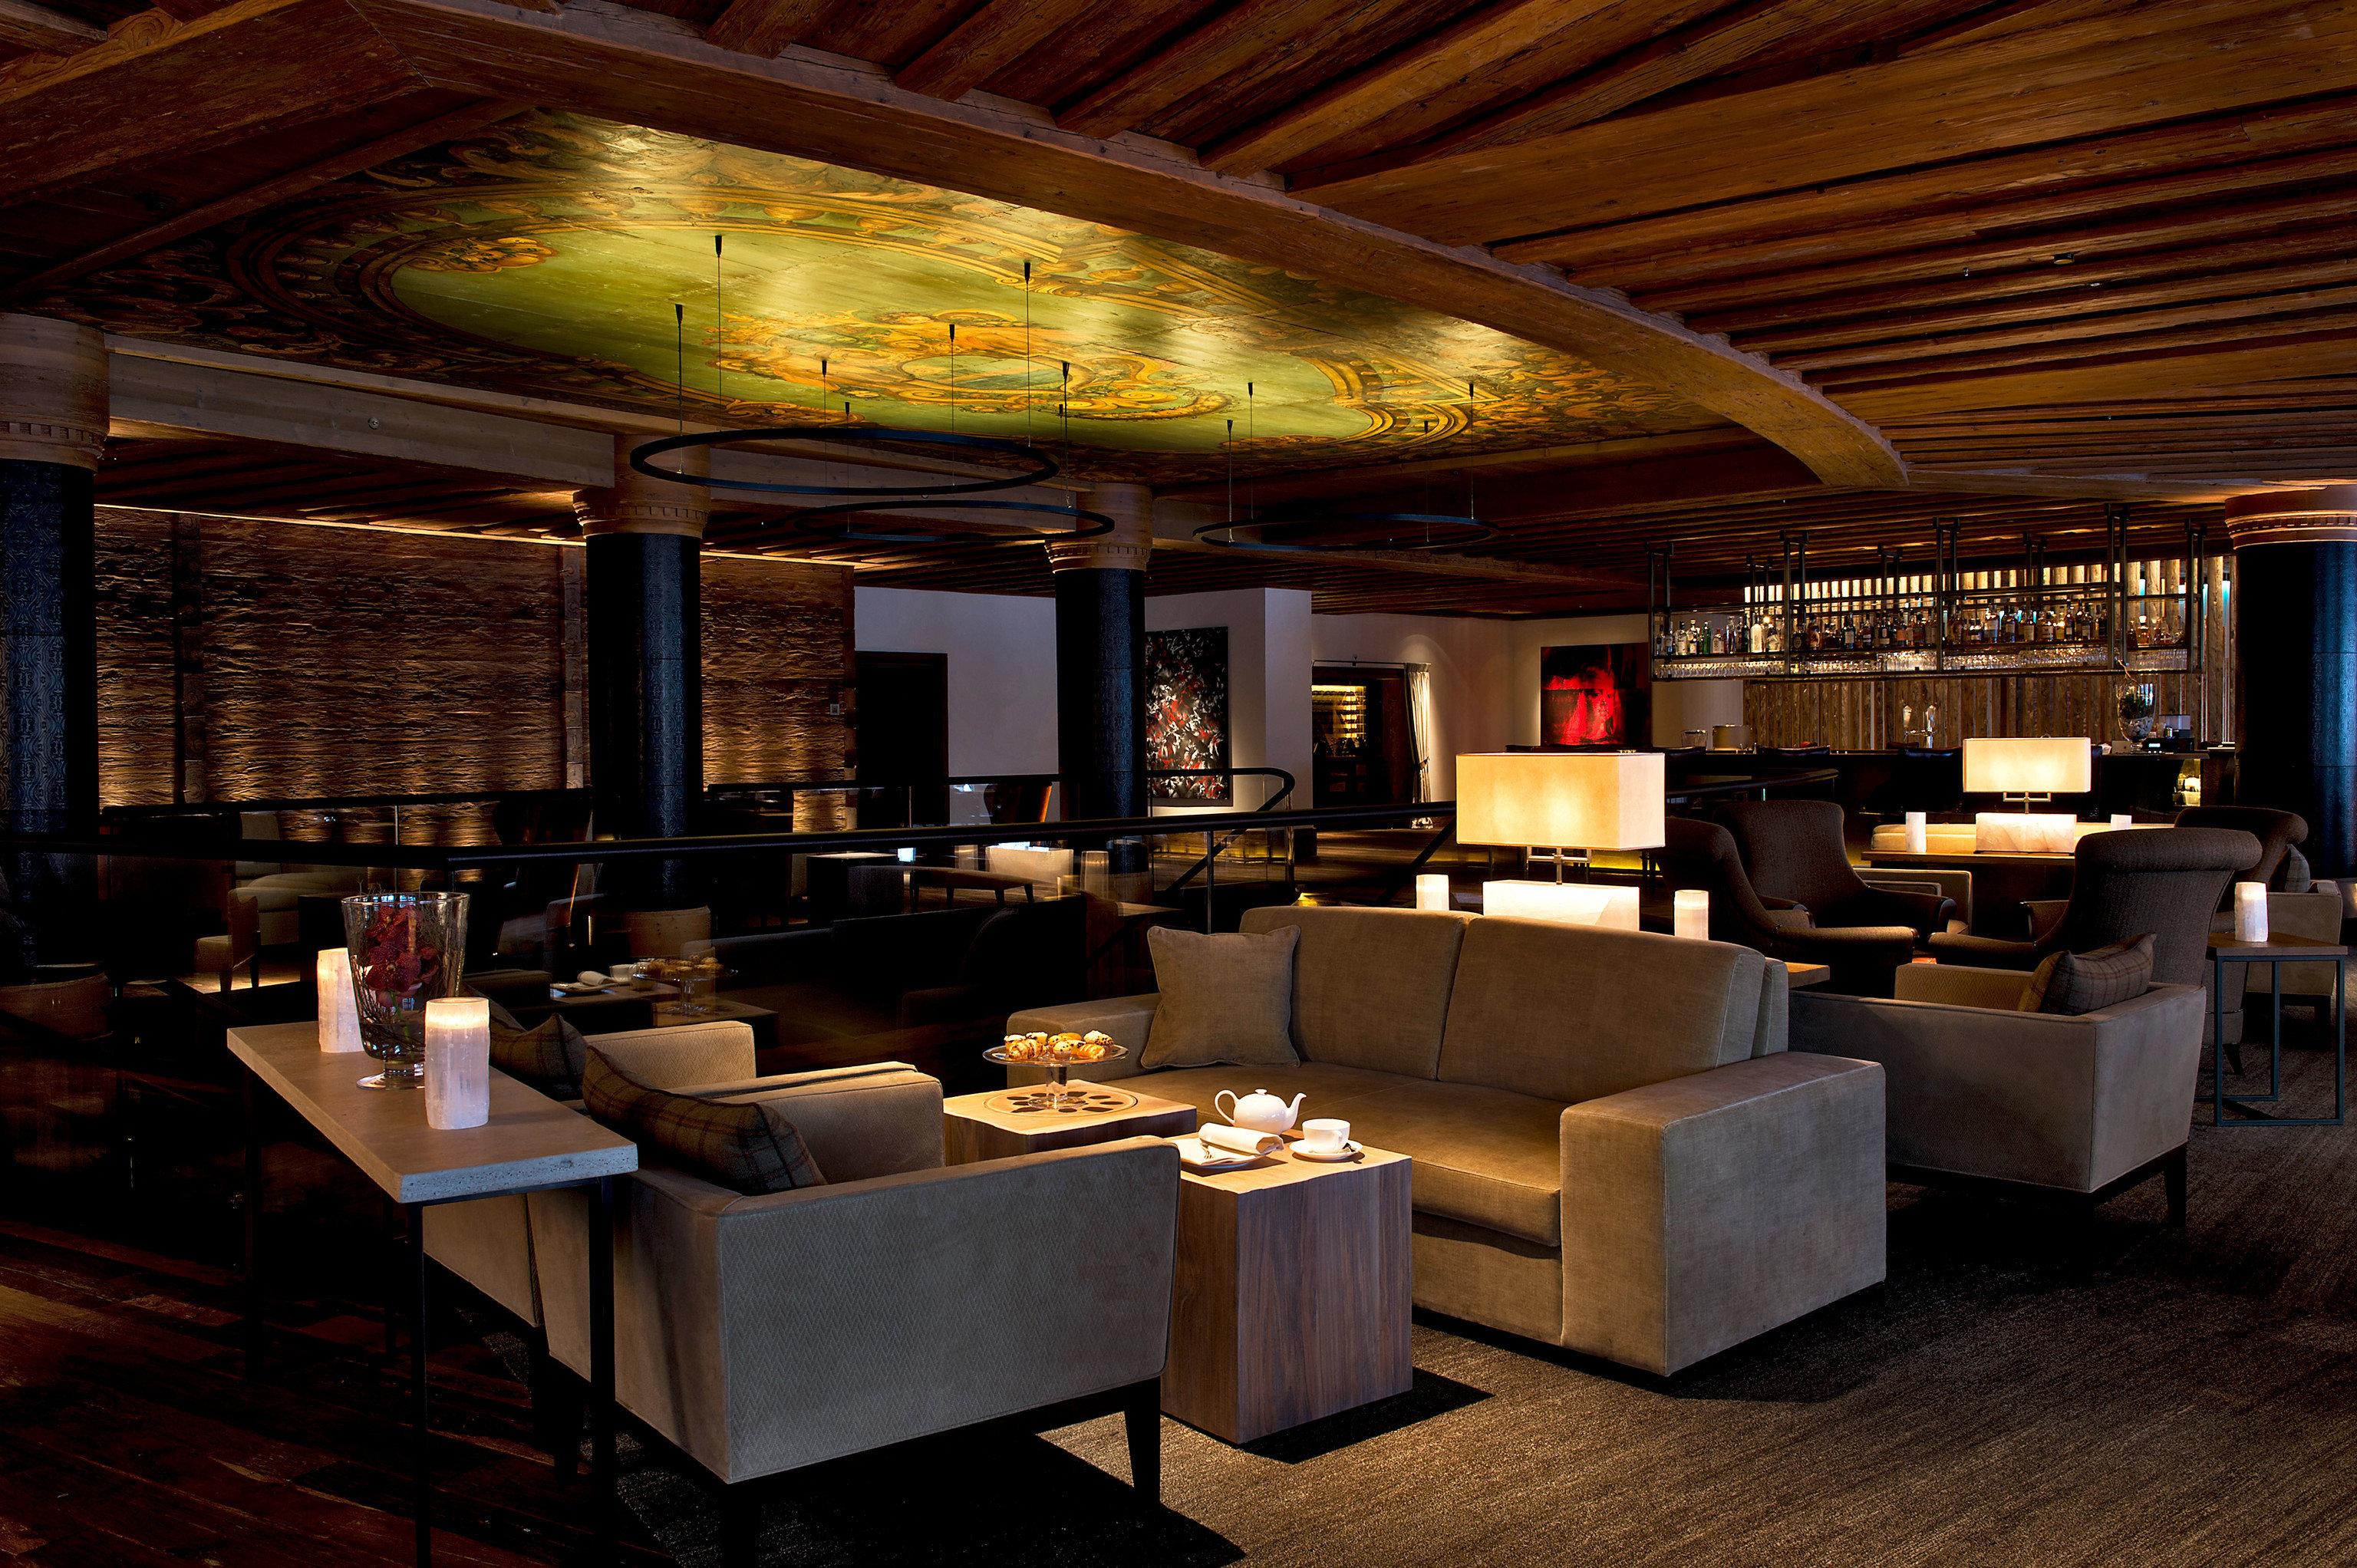 restaurant Lobby Bar lighting recreation room café function hall living room Island